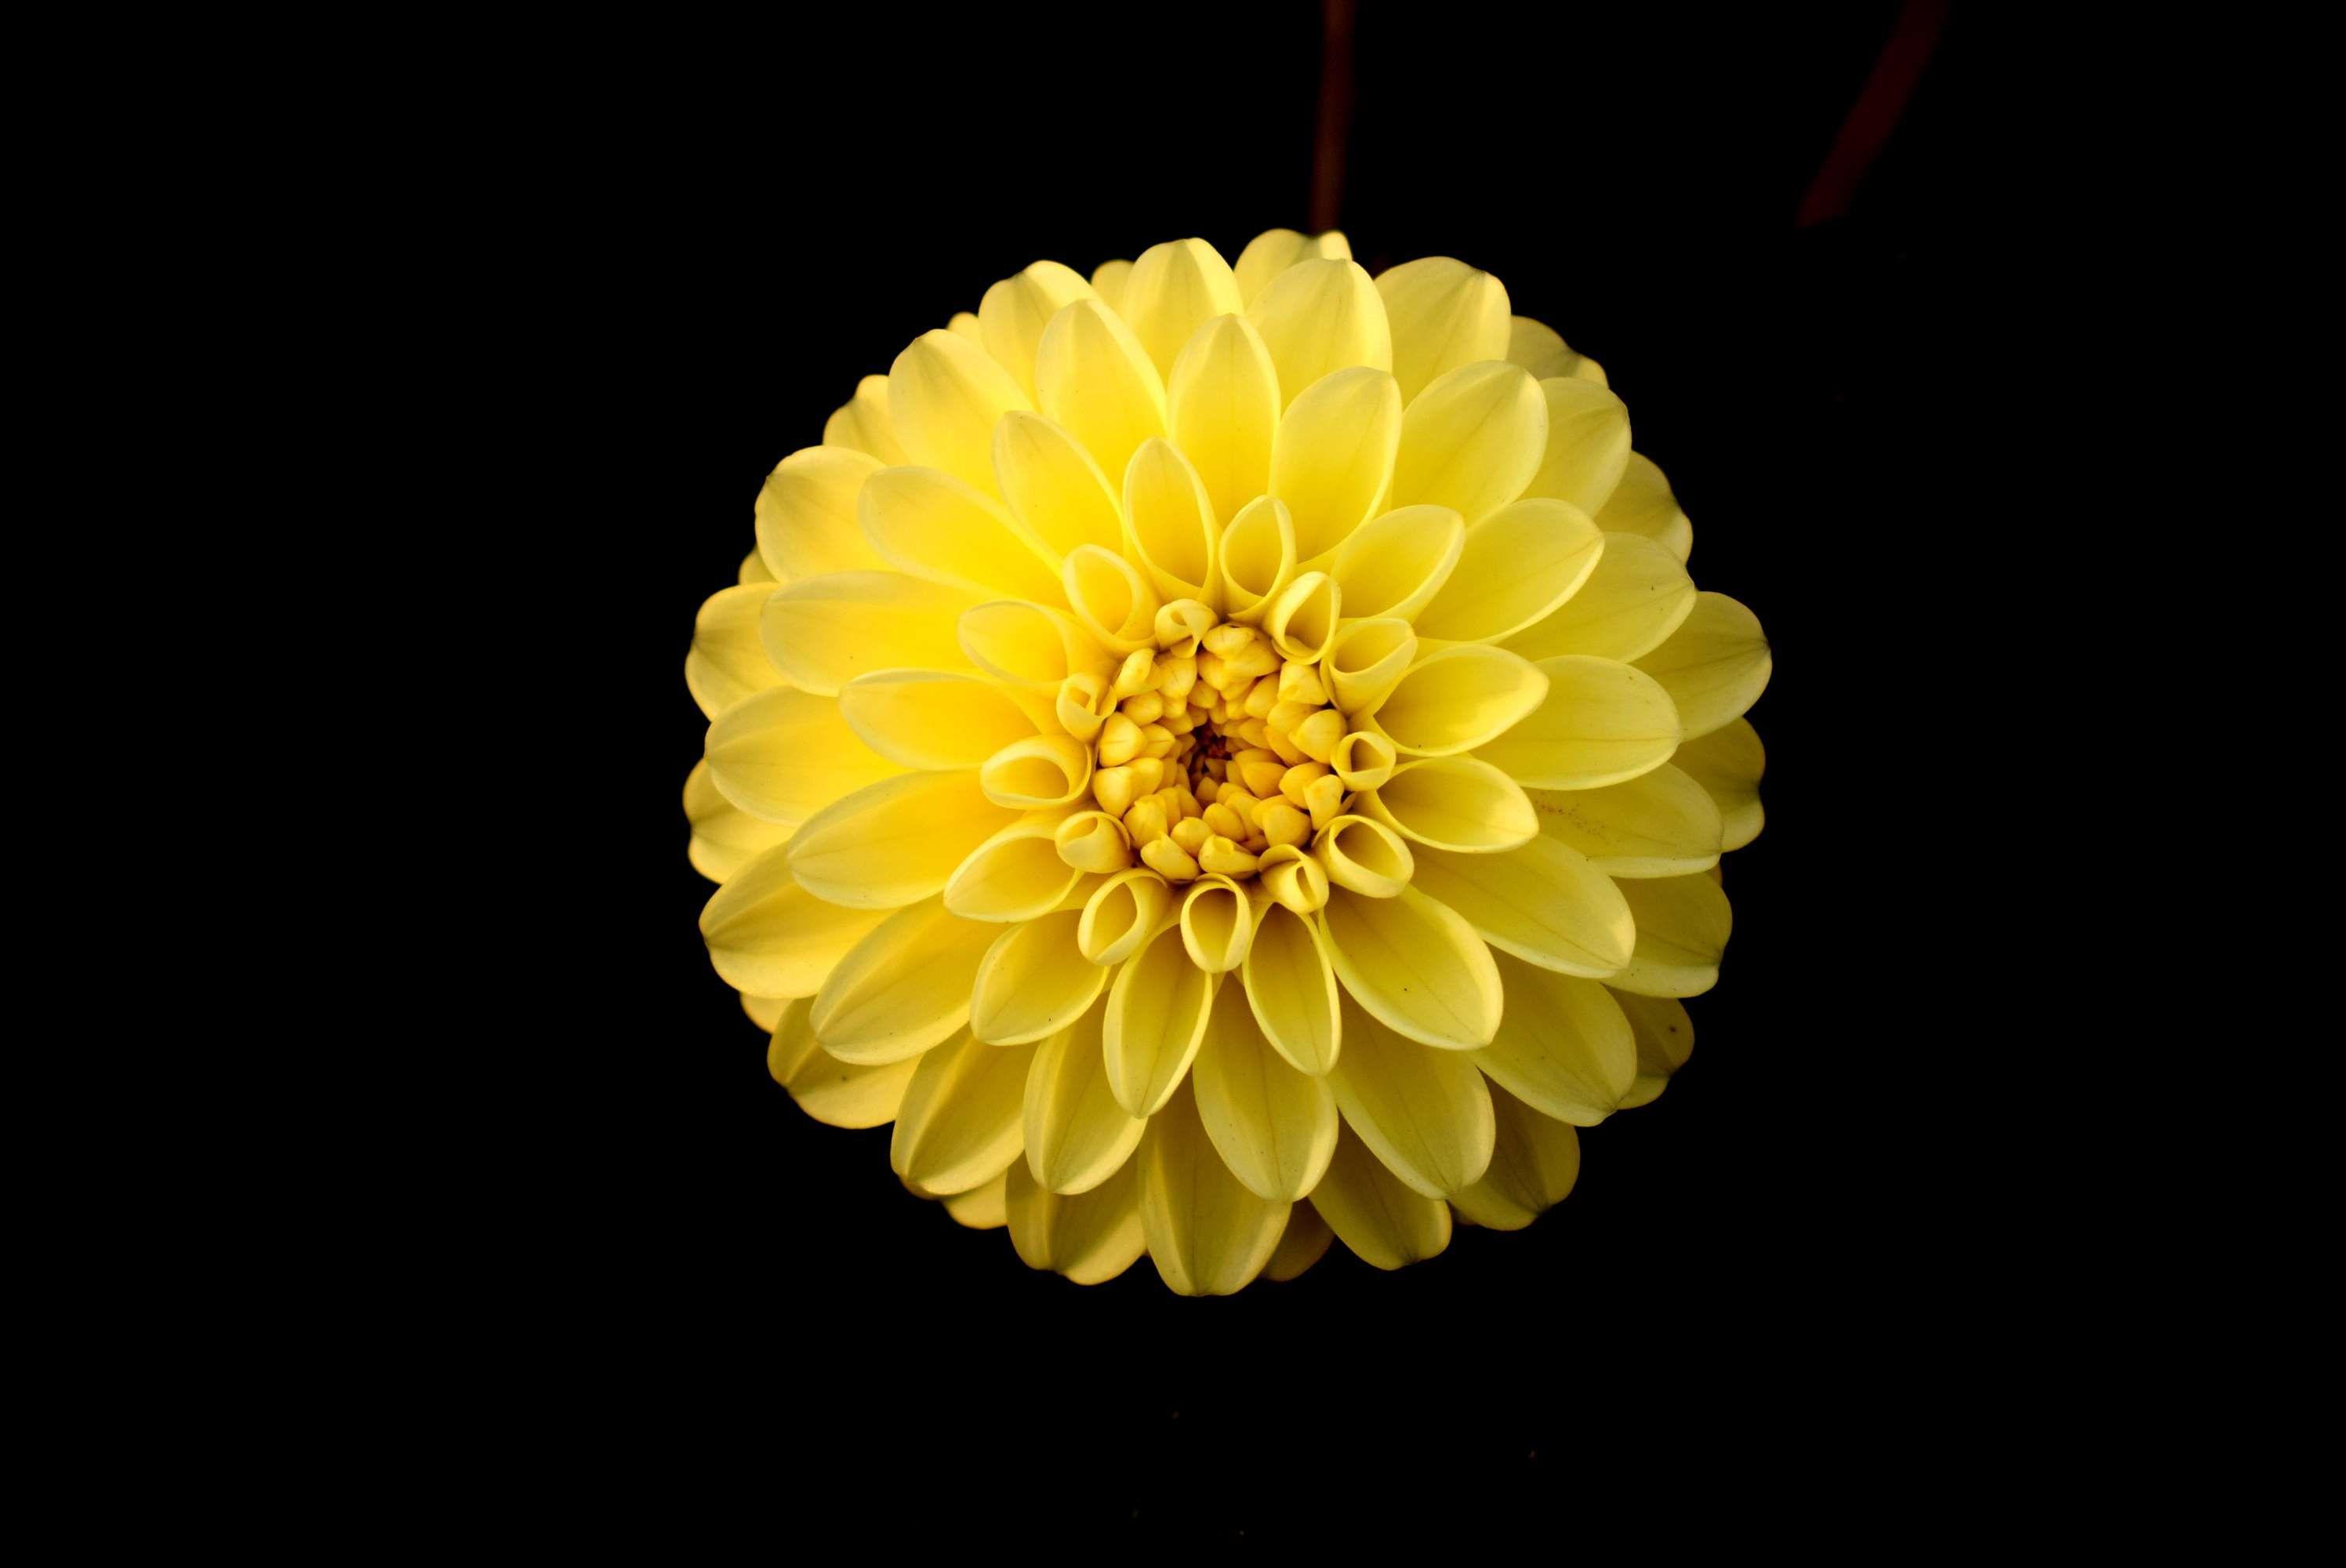 Dahlia Flower Flowers Garden Nature Single Flower Yellow